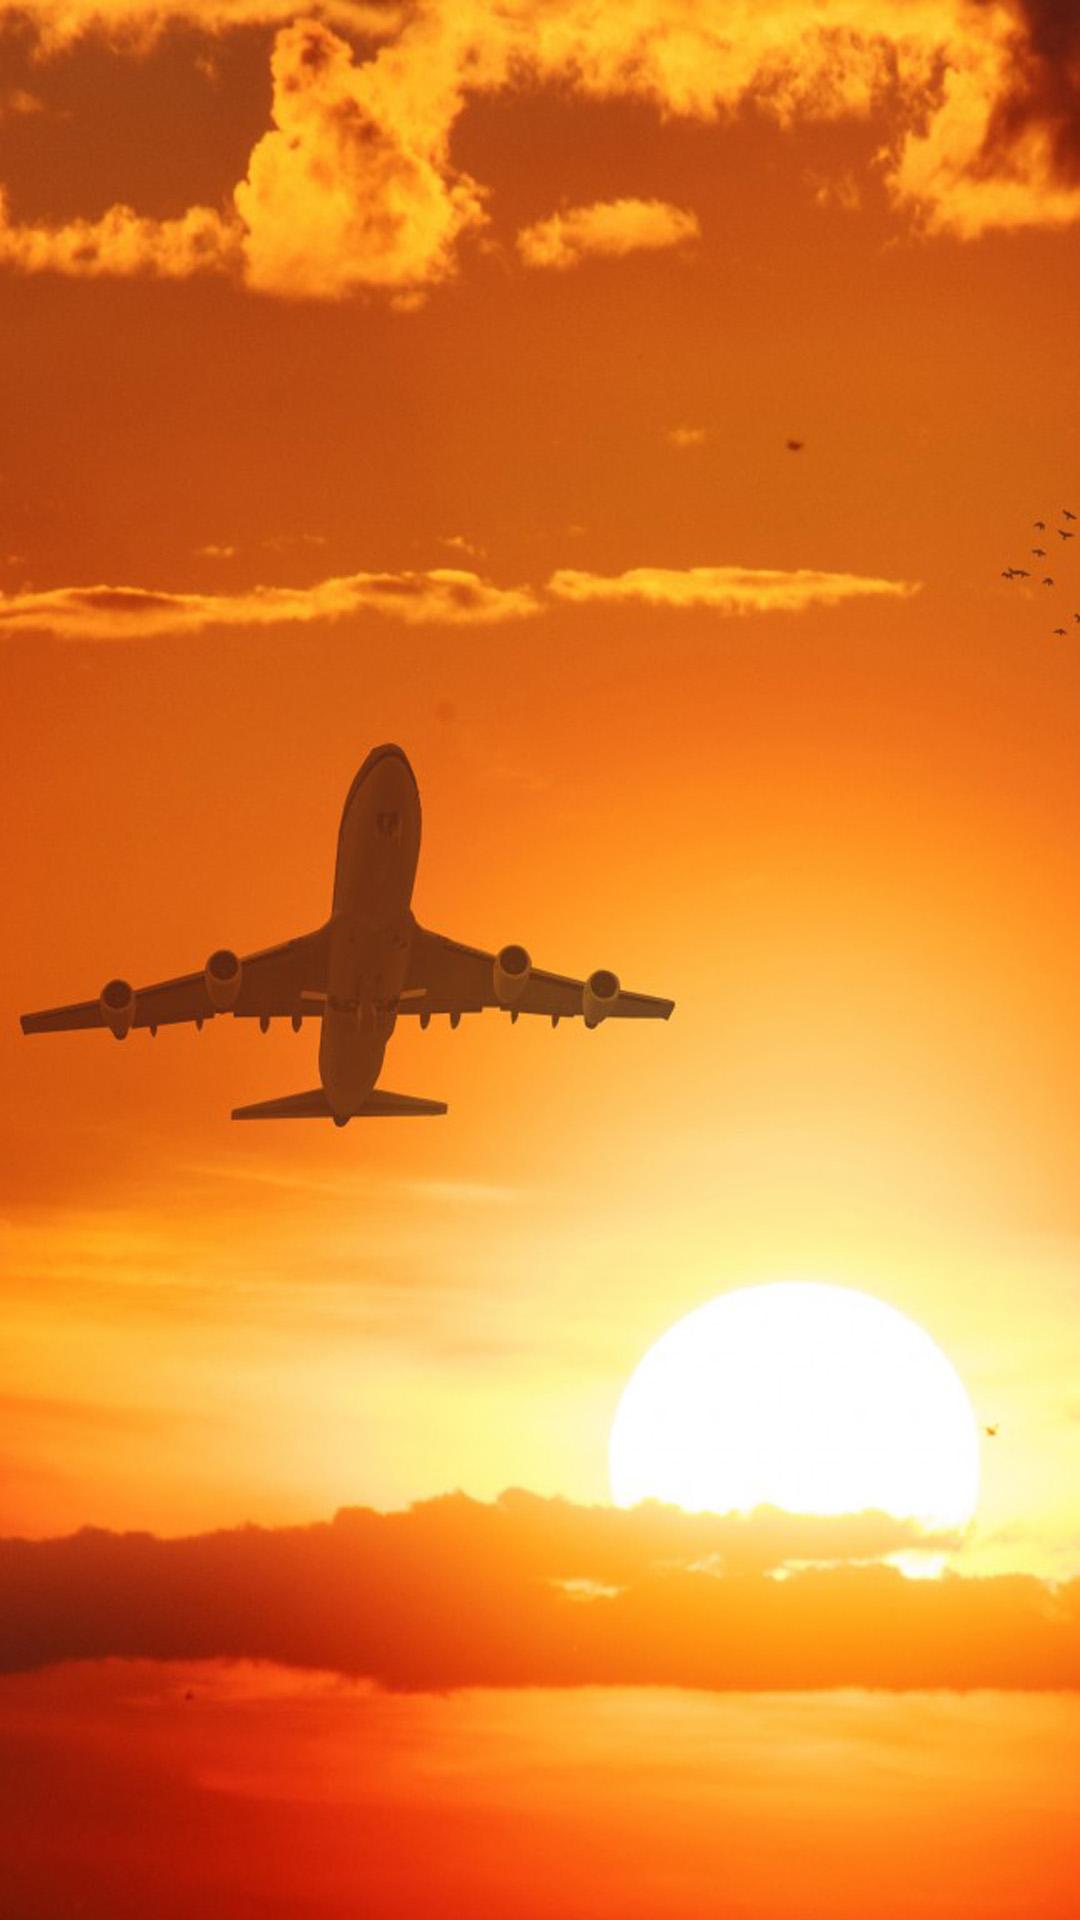 Ganapati Wallpaper Hd Download Airplane Flight Sunset Clouds Free Pure 4k Ultra